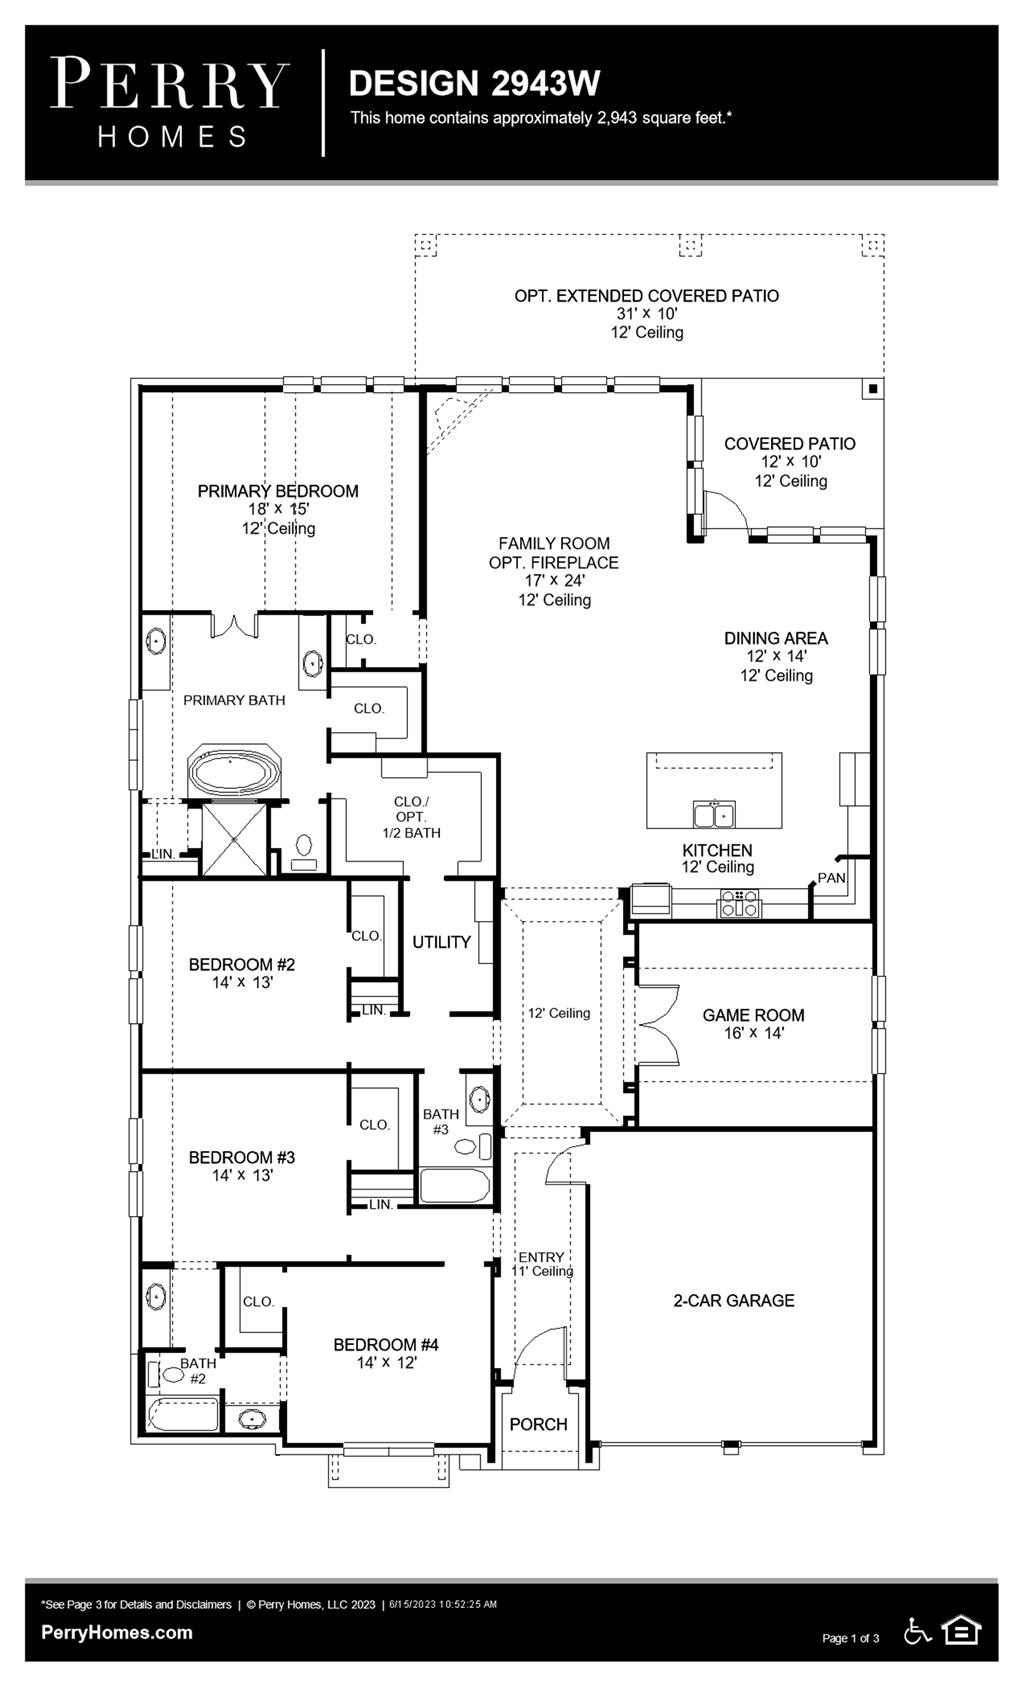 Floor Plan for 2943W